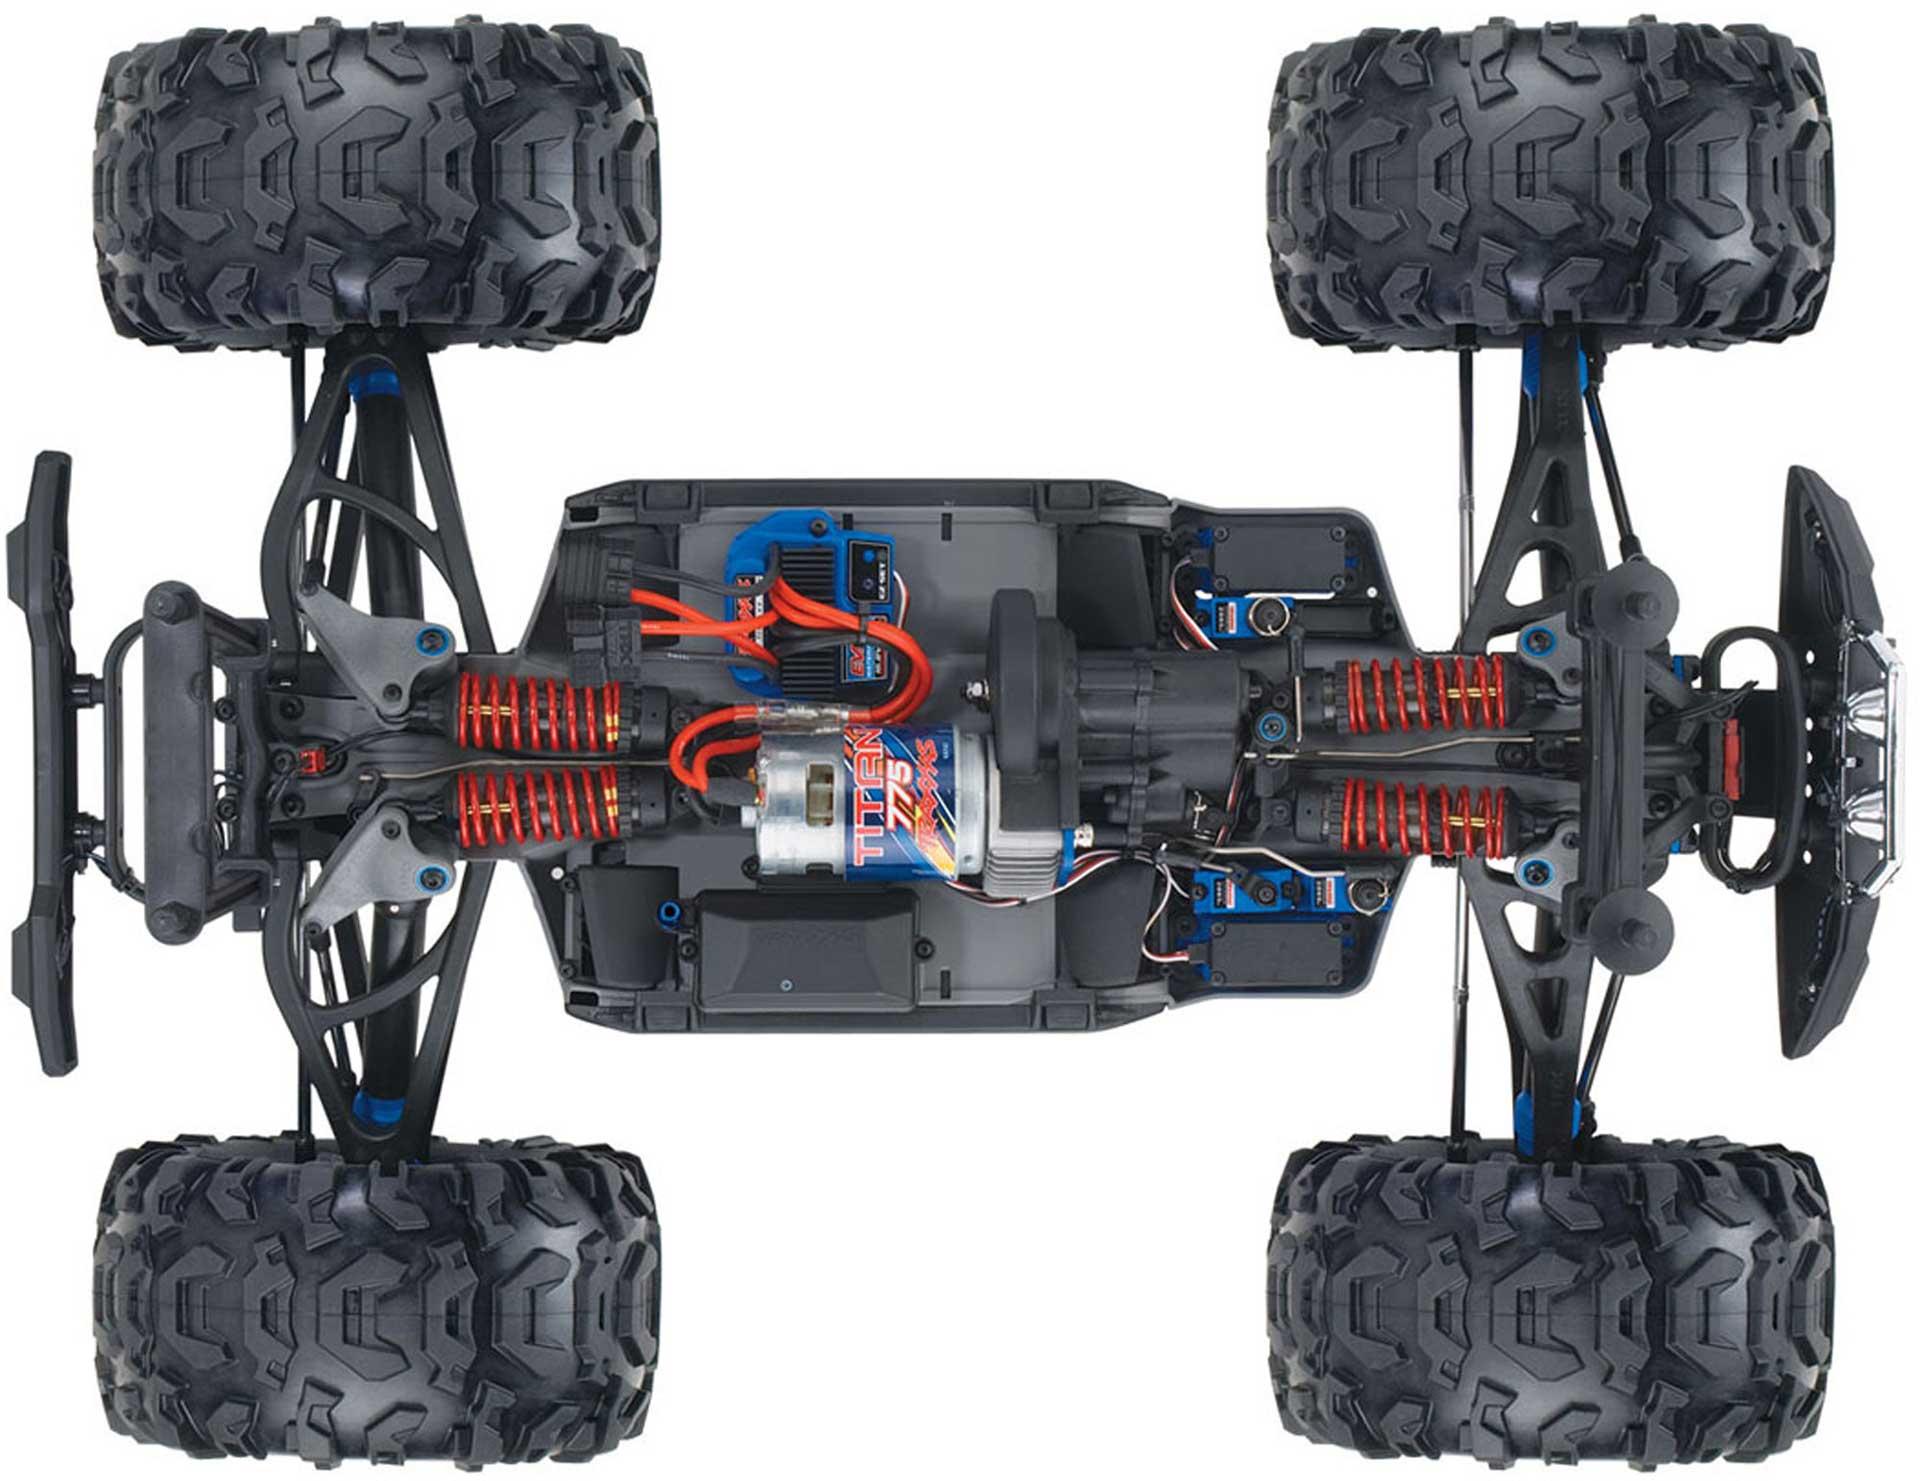 TRAXXAS SUMMIT PURPLE RTR EVX2 1/8 4WD EXTREME TERRAIN MONSTER TRUCK